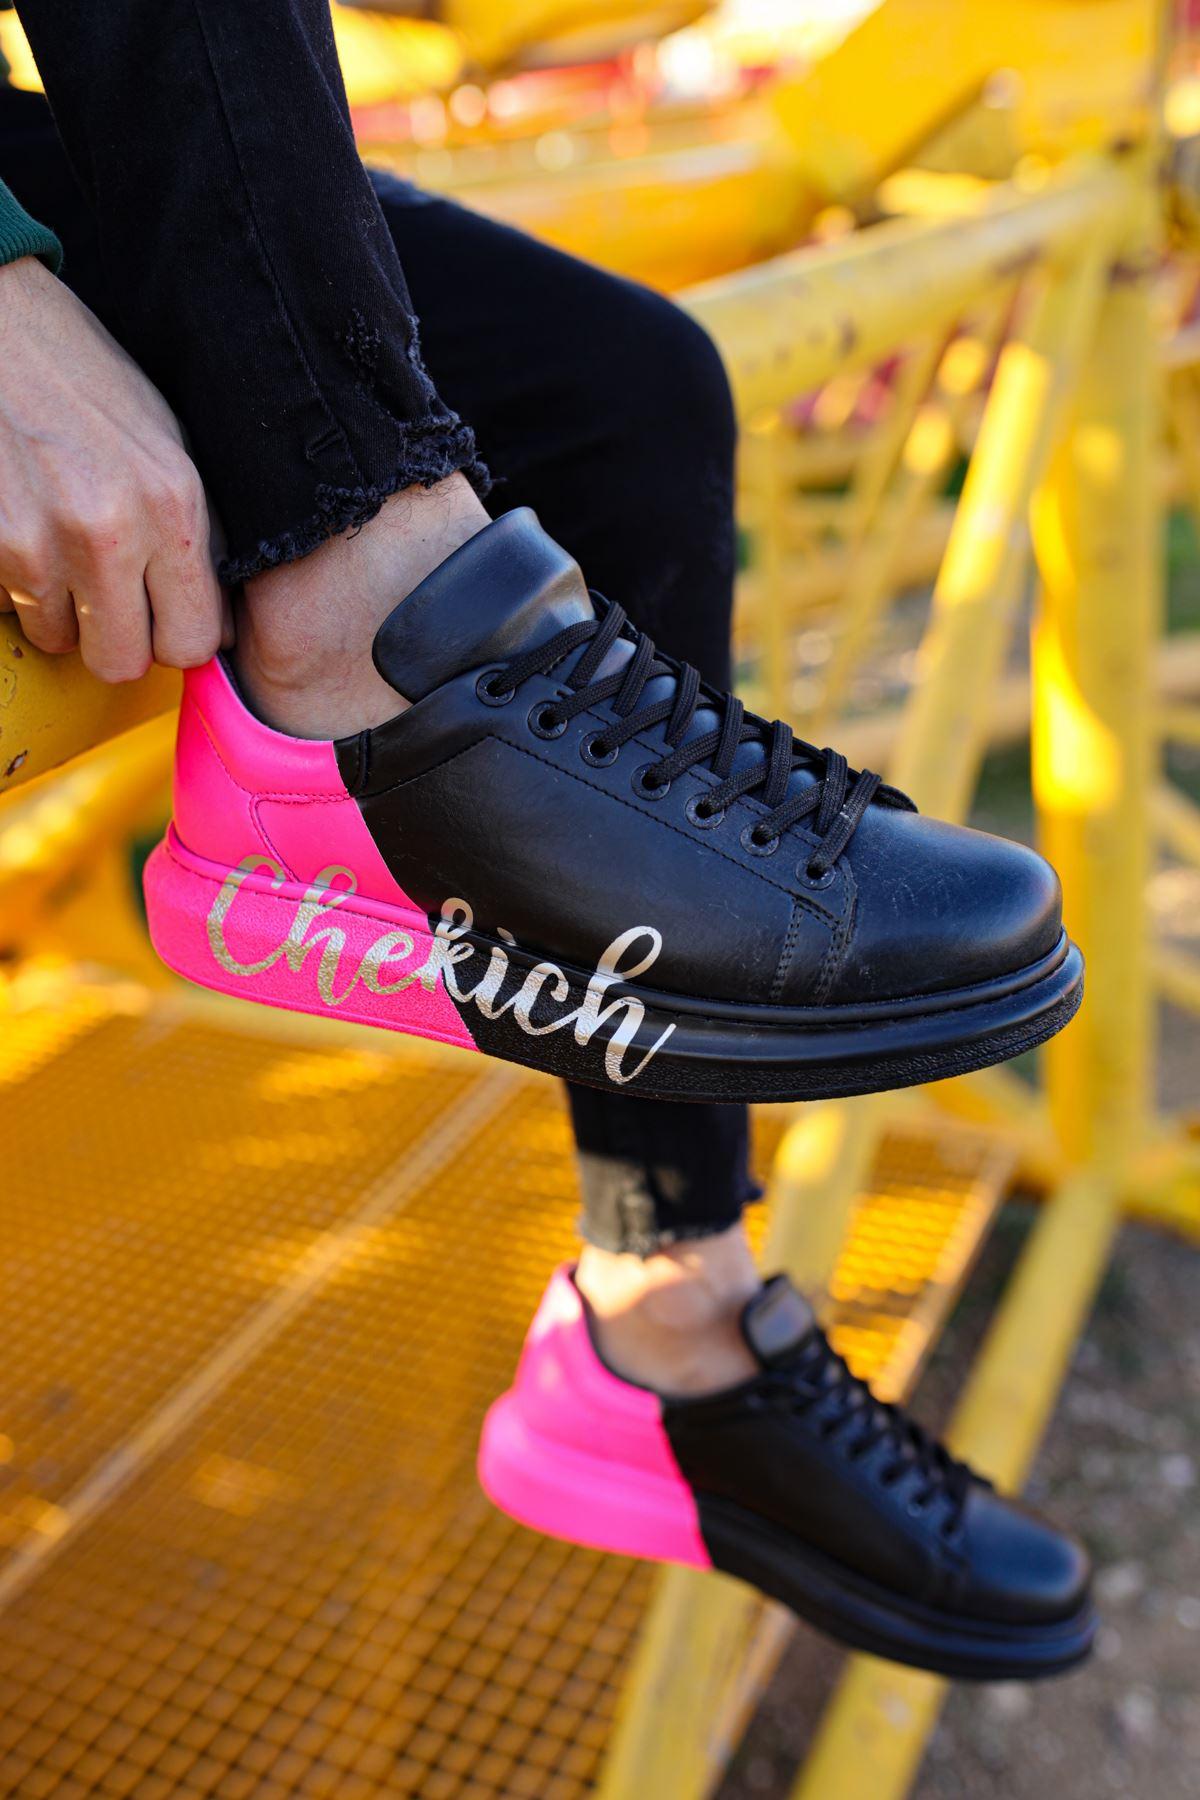 Chekich CH254 ST Erkek Ayakkabı 477 SİYAH / PEMBE  CHEKICH